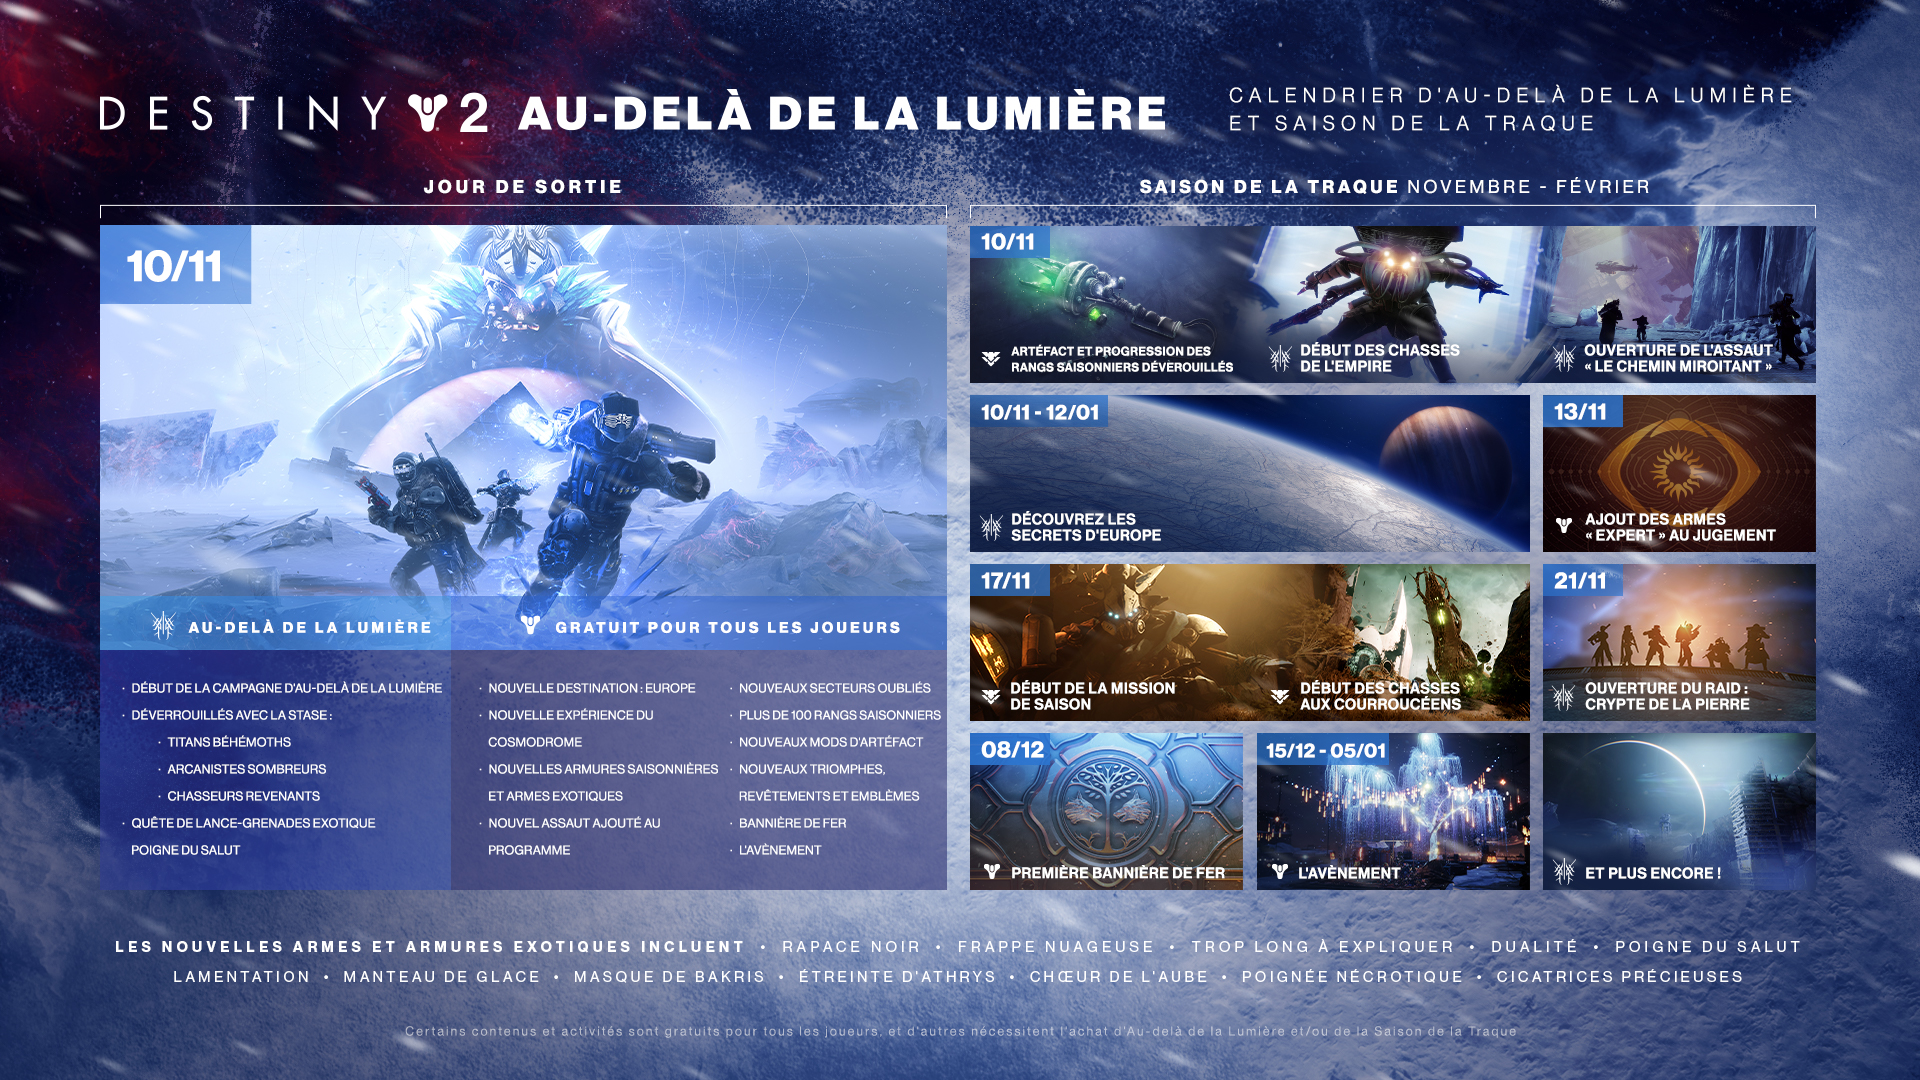 maj-3.0.0.1-destiny-2-dlc-au-dela-de-la-lumiere